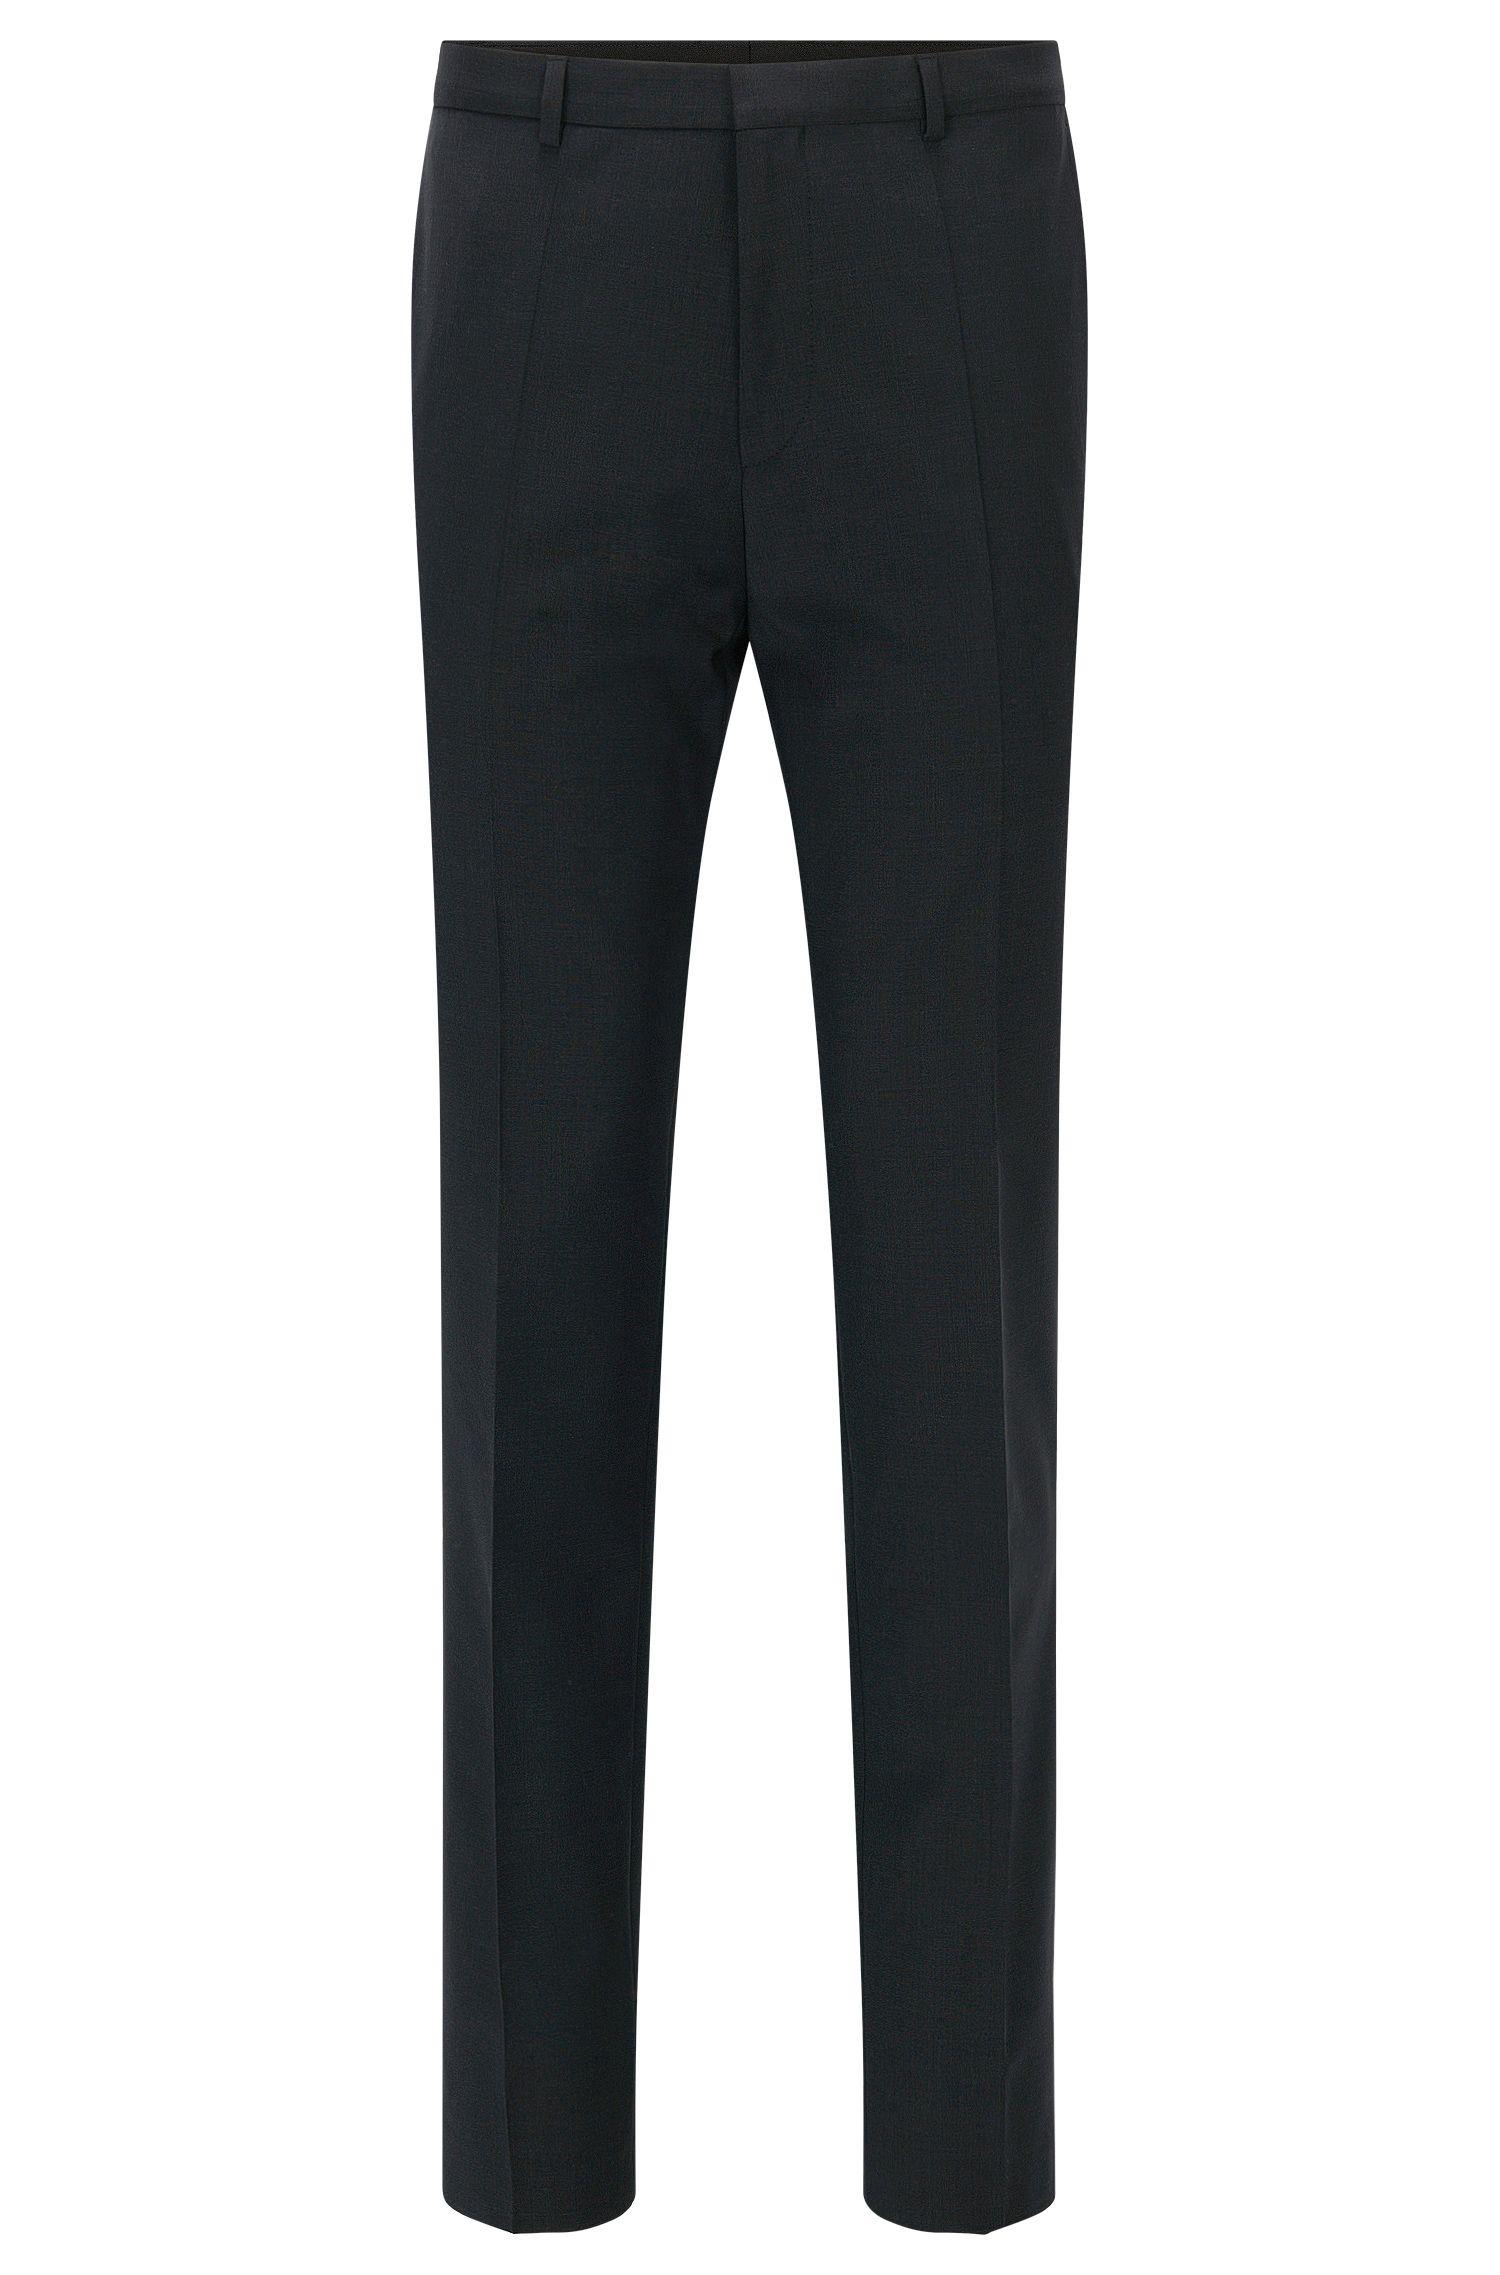 Pantaloni extra slim fit in lana vergine HUGO Uomo